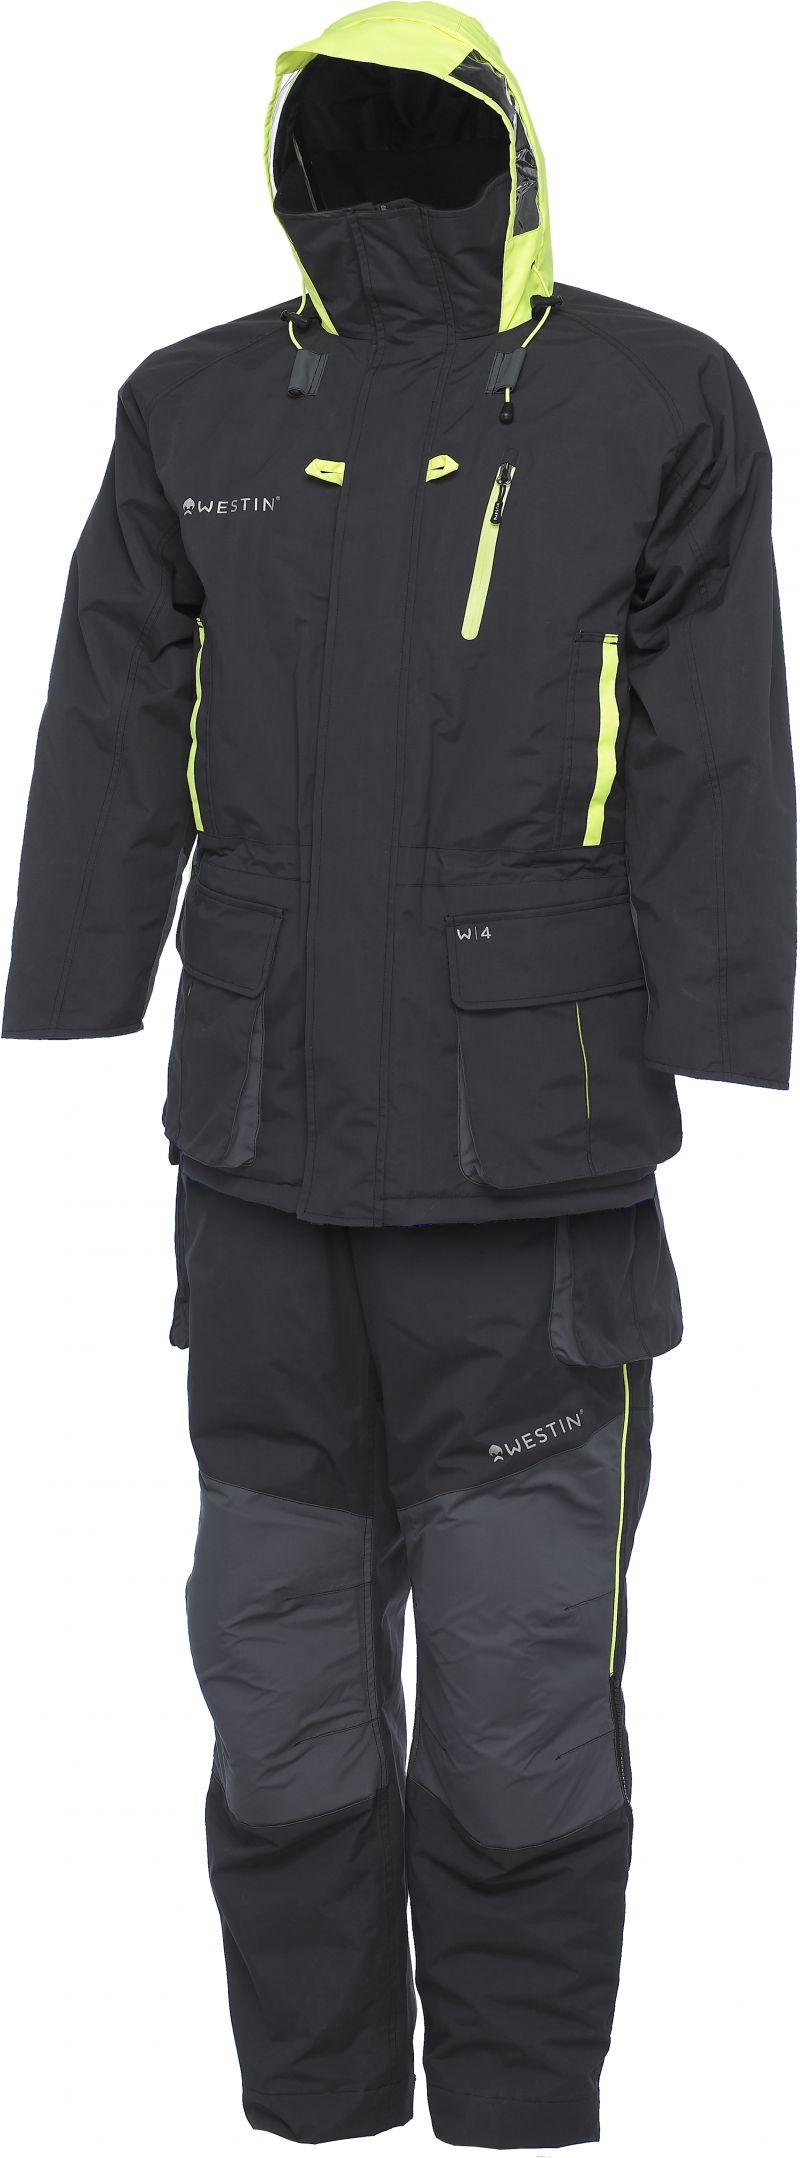 Westin W4 Winter Suit metal lemon warmtepak Xxxl